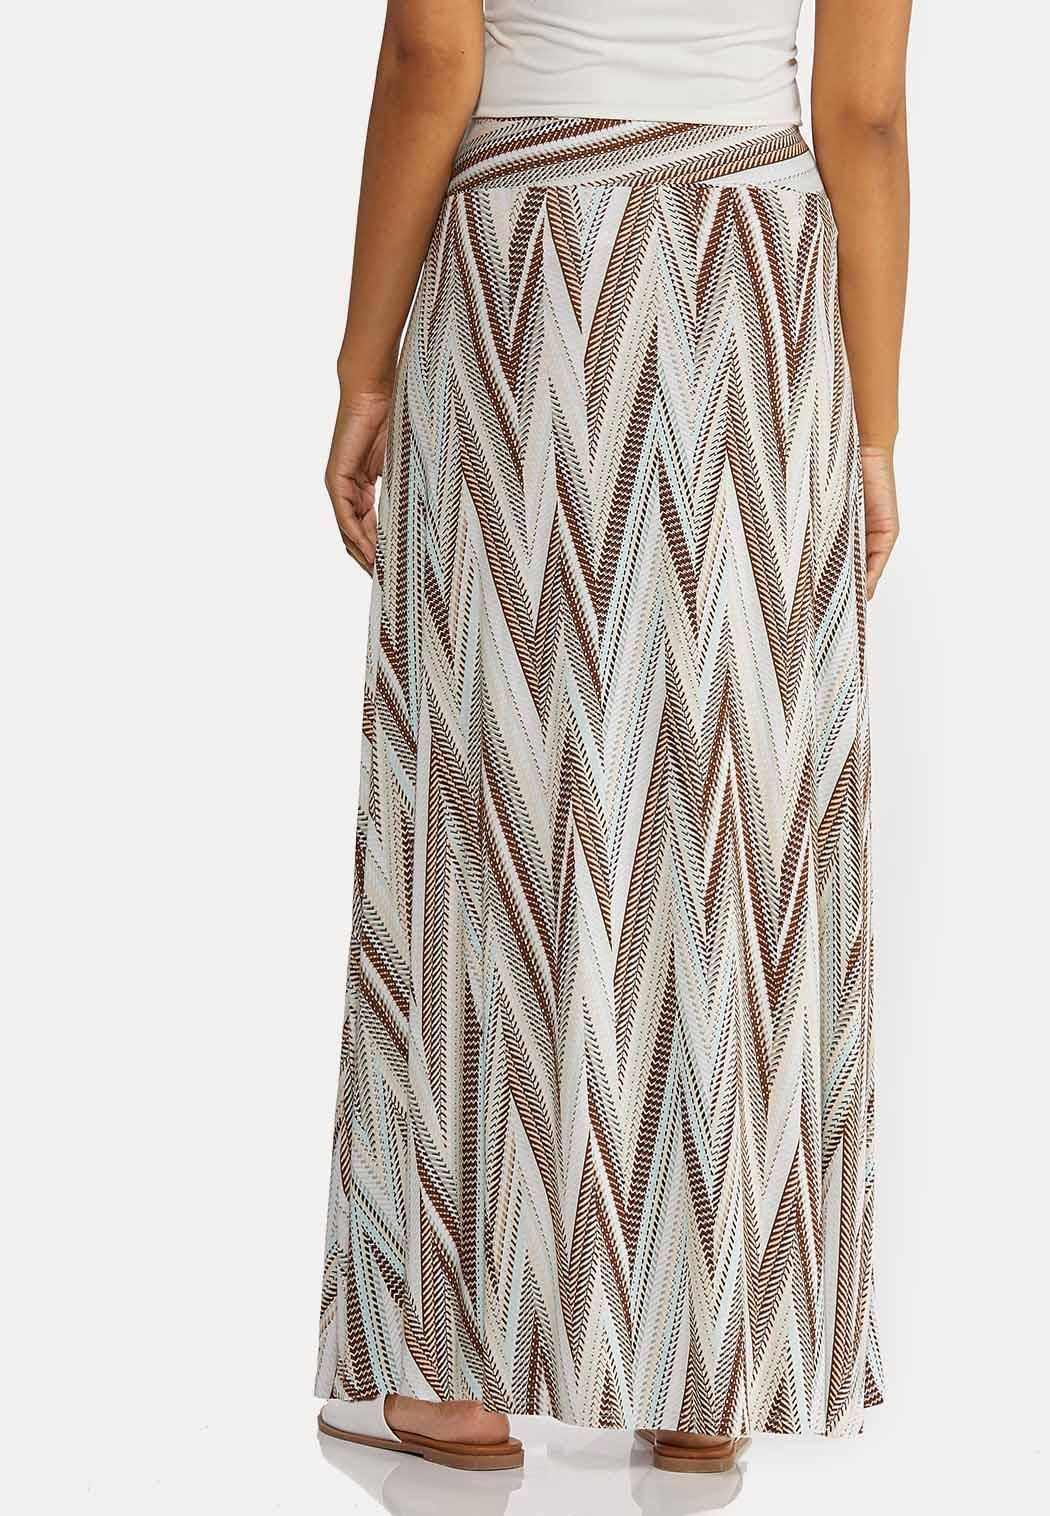 Petite Chevron Maxi Skirt (Item #44268987)